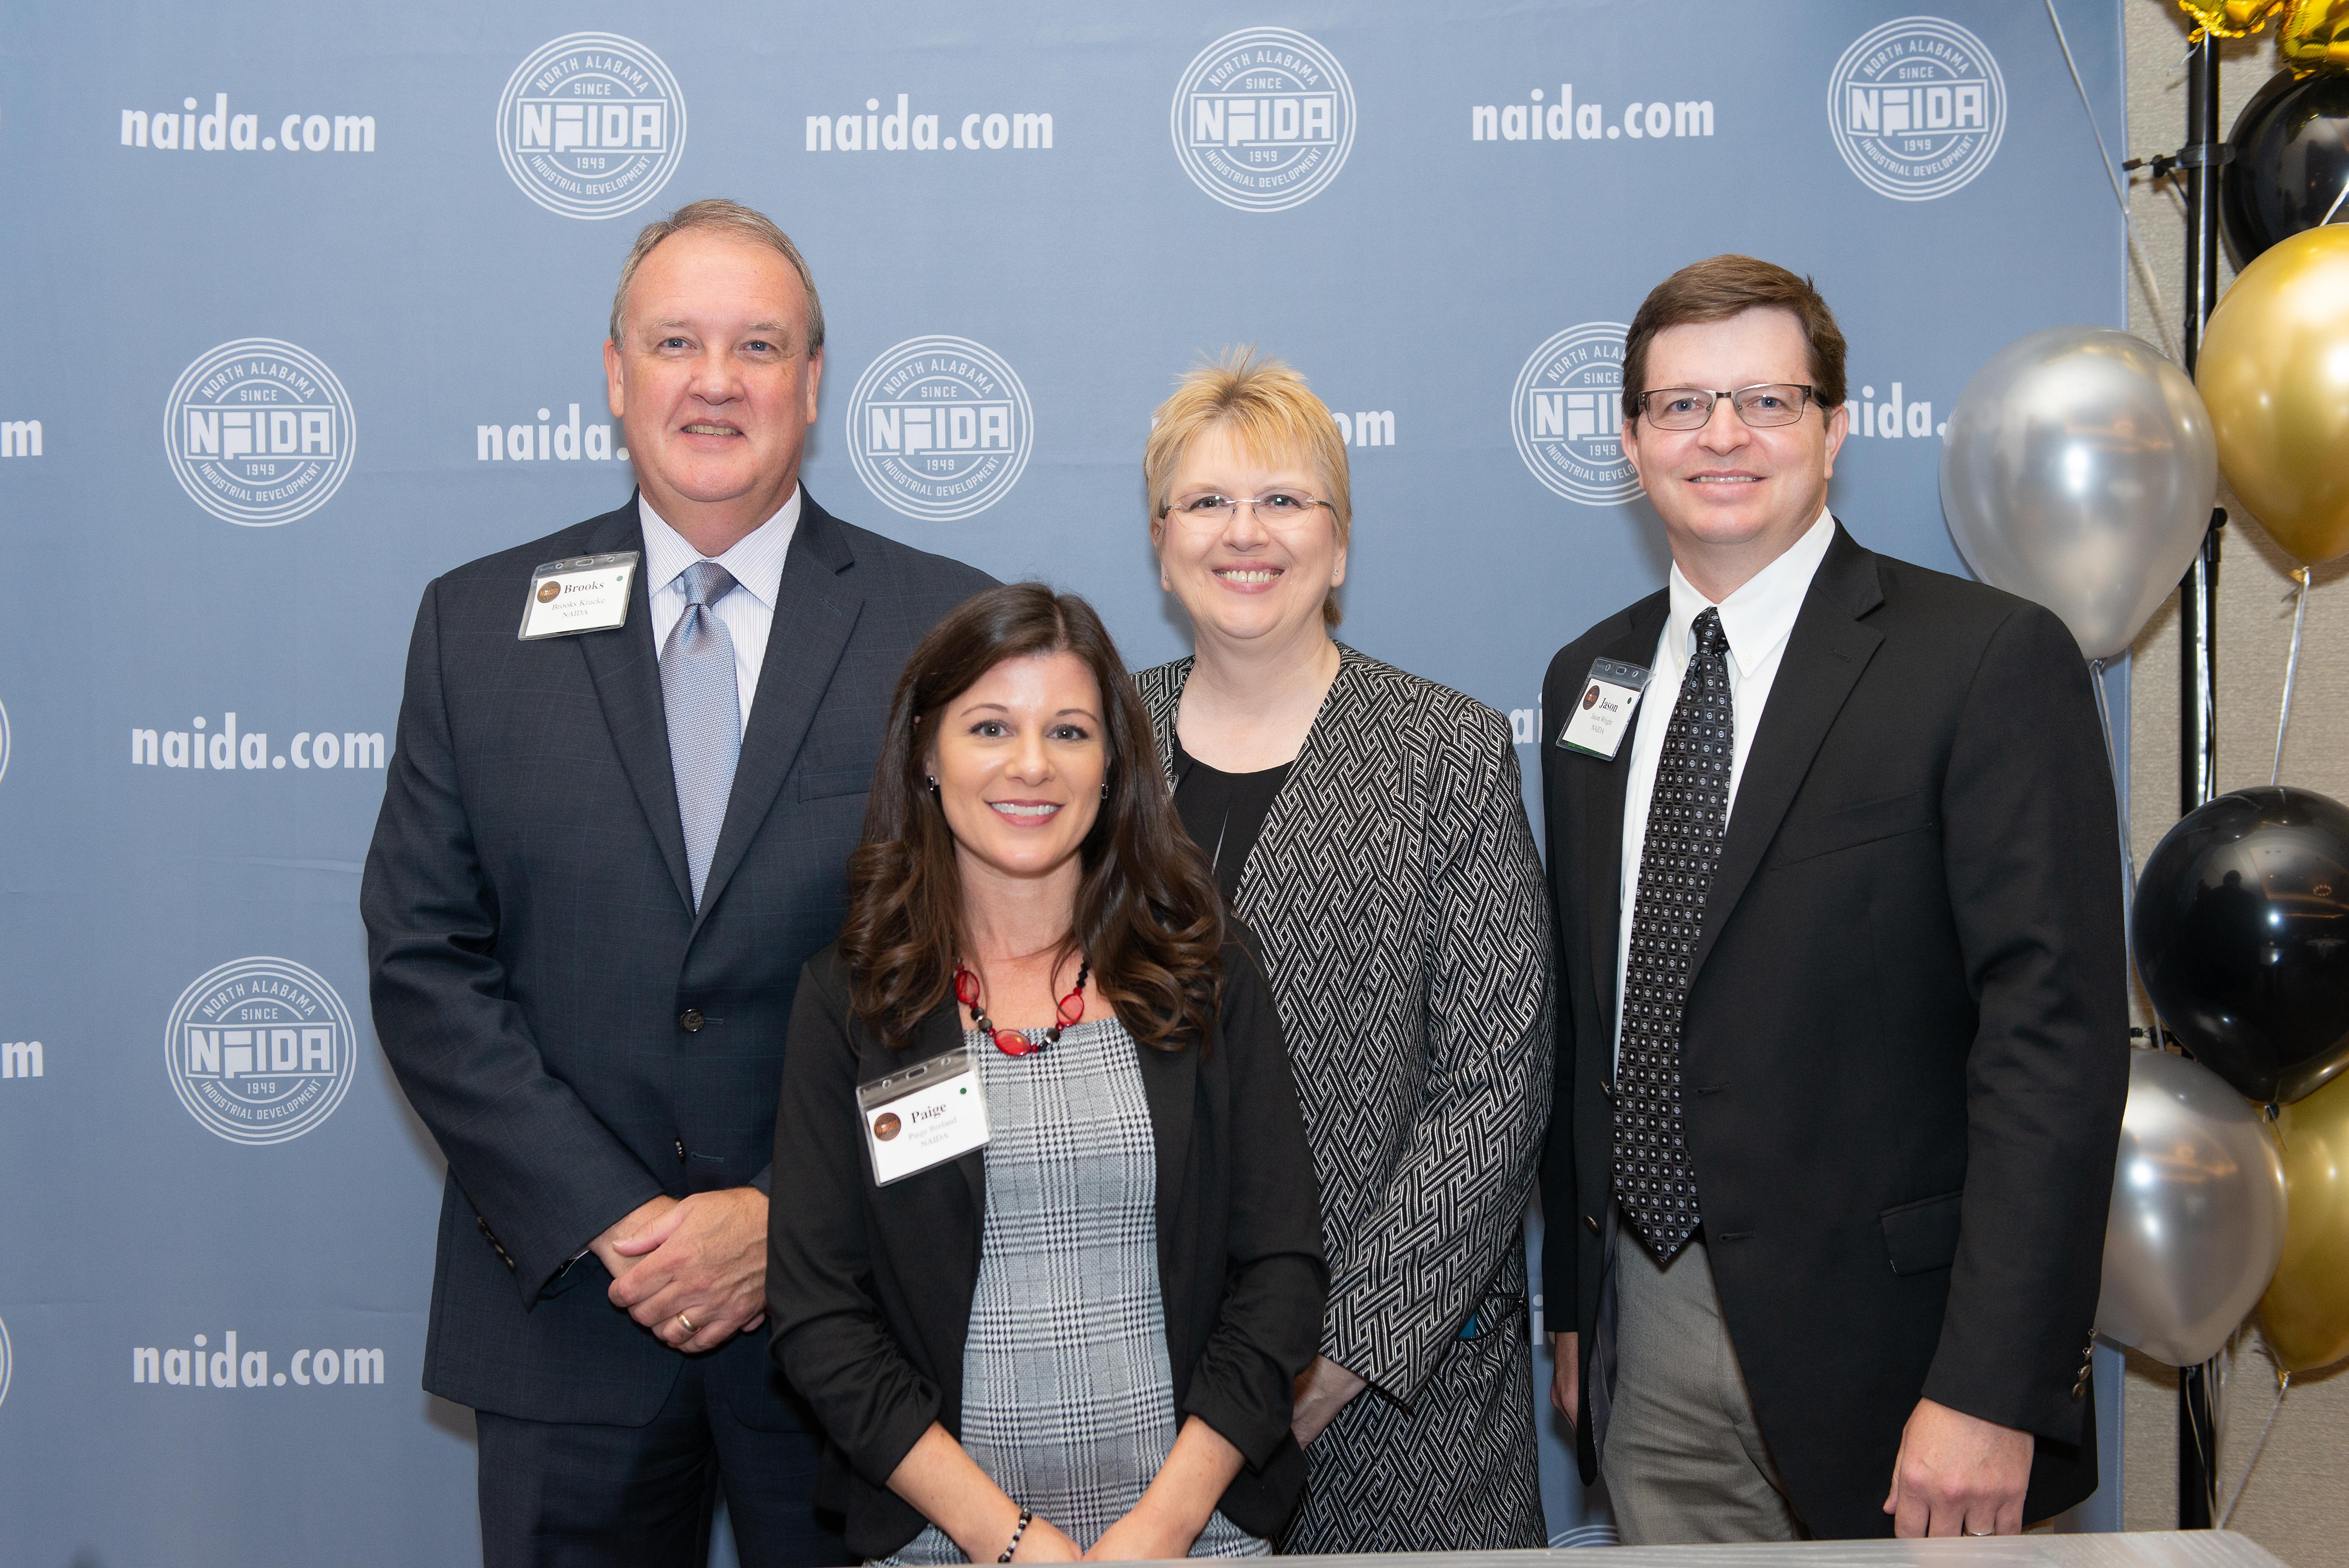 NAIDA team in 2020